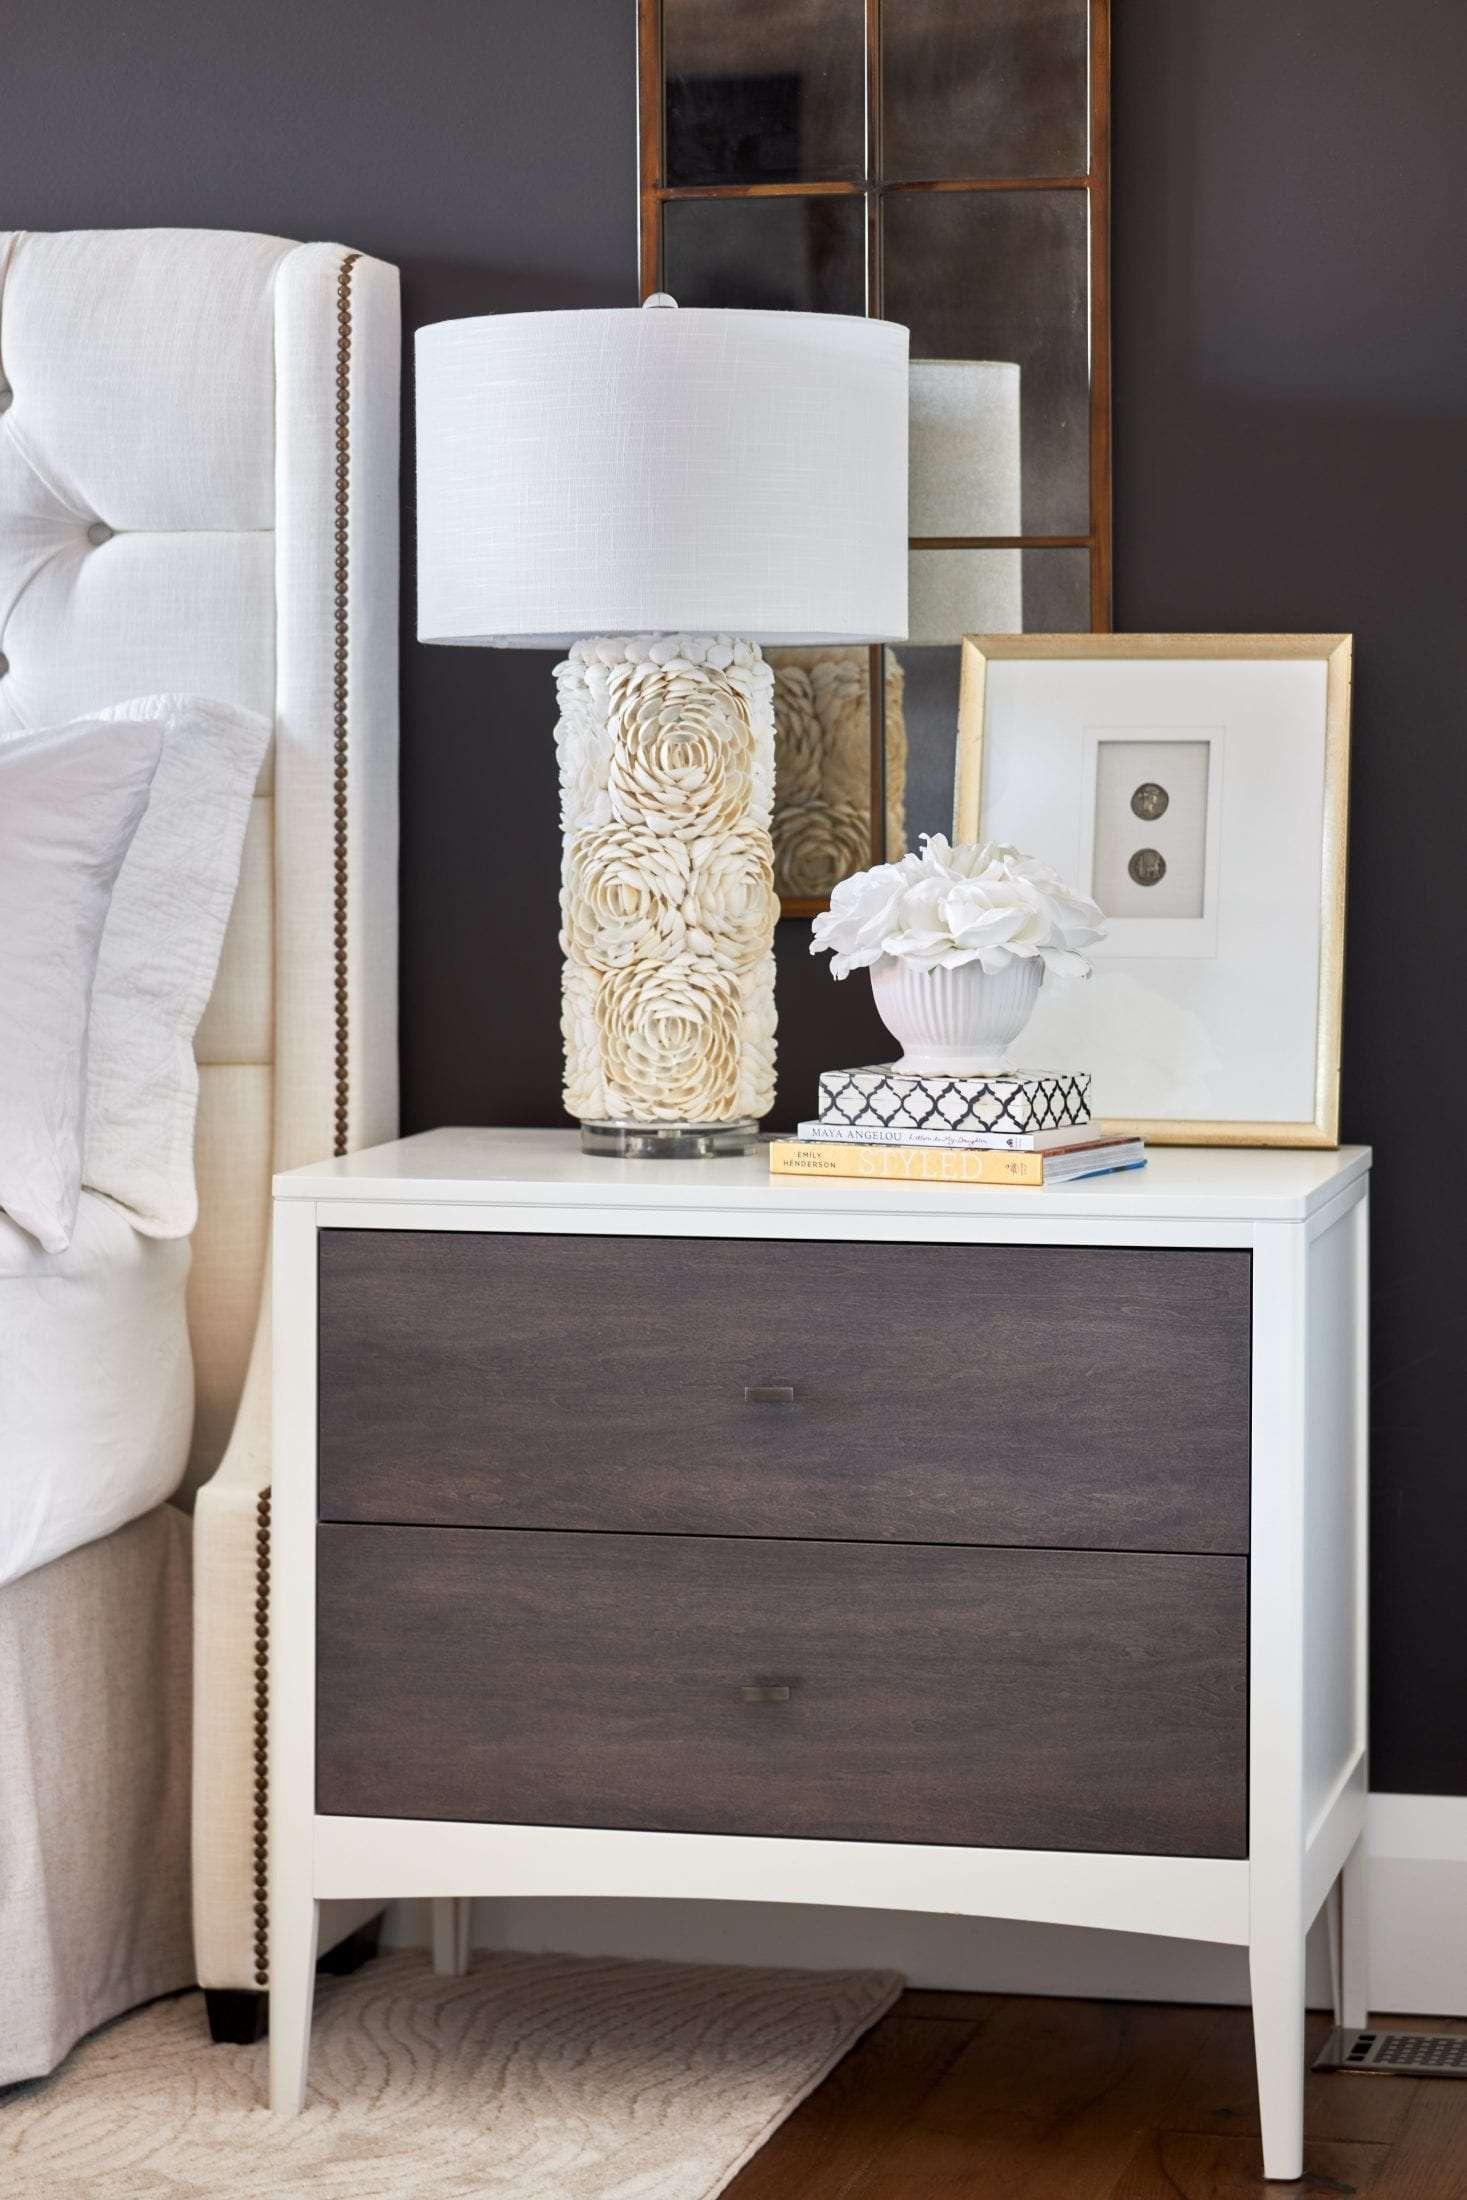 Interior Design Master bedroom Geovin custom nightstand Benjamin Moore Dove White